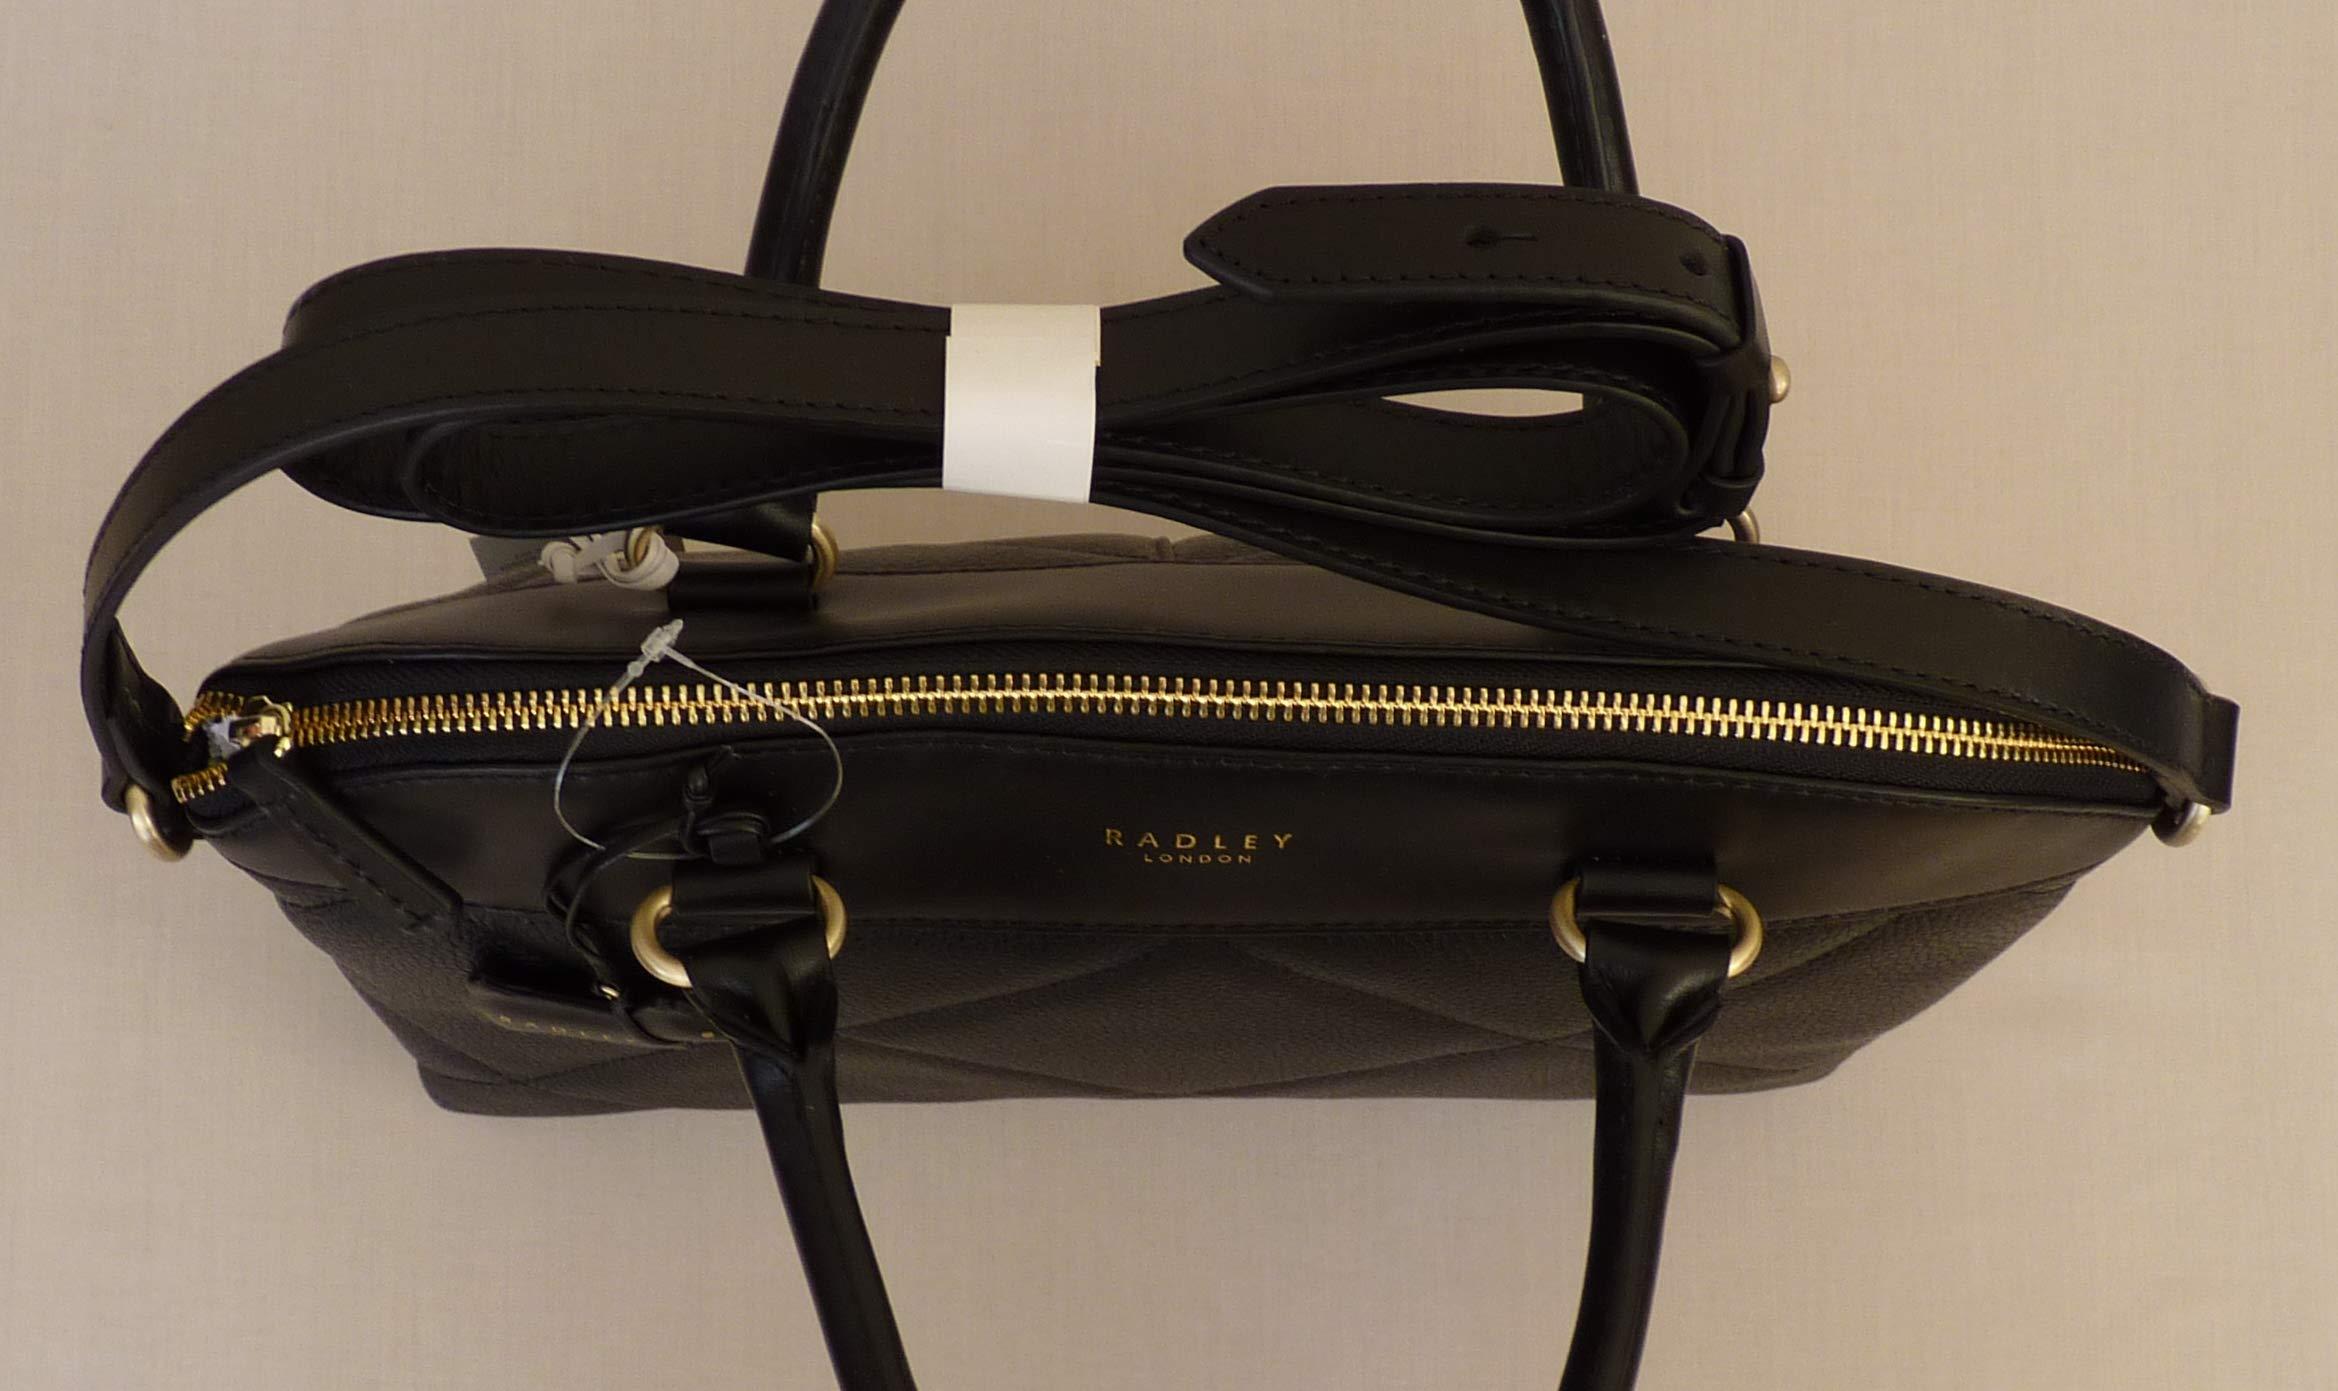 d7d1205f4f RADLEY 'Fenchurch Street' Medium Black Leather Multiway Bag – NEW ...